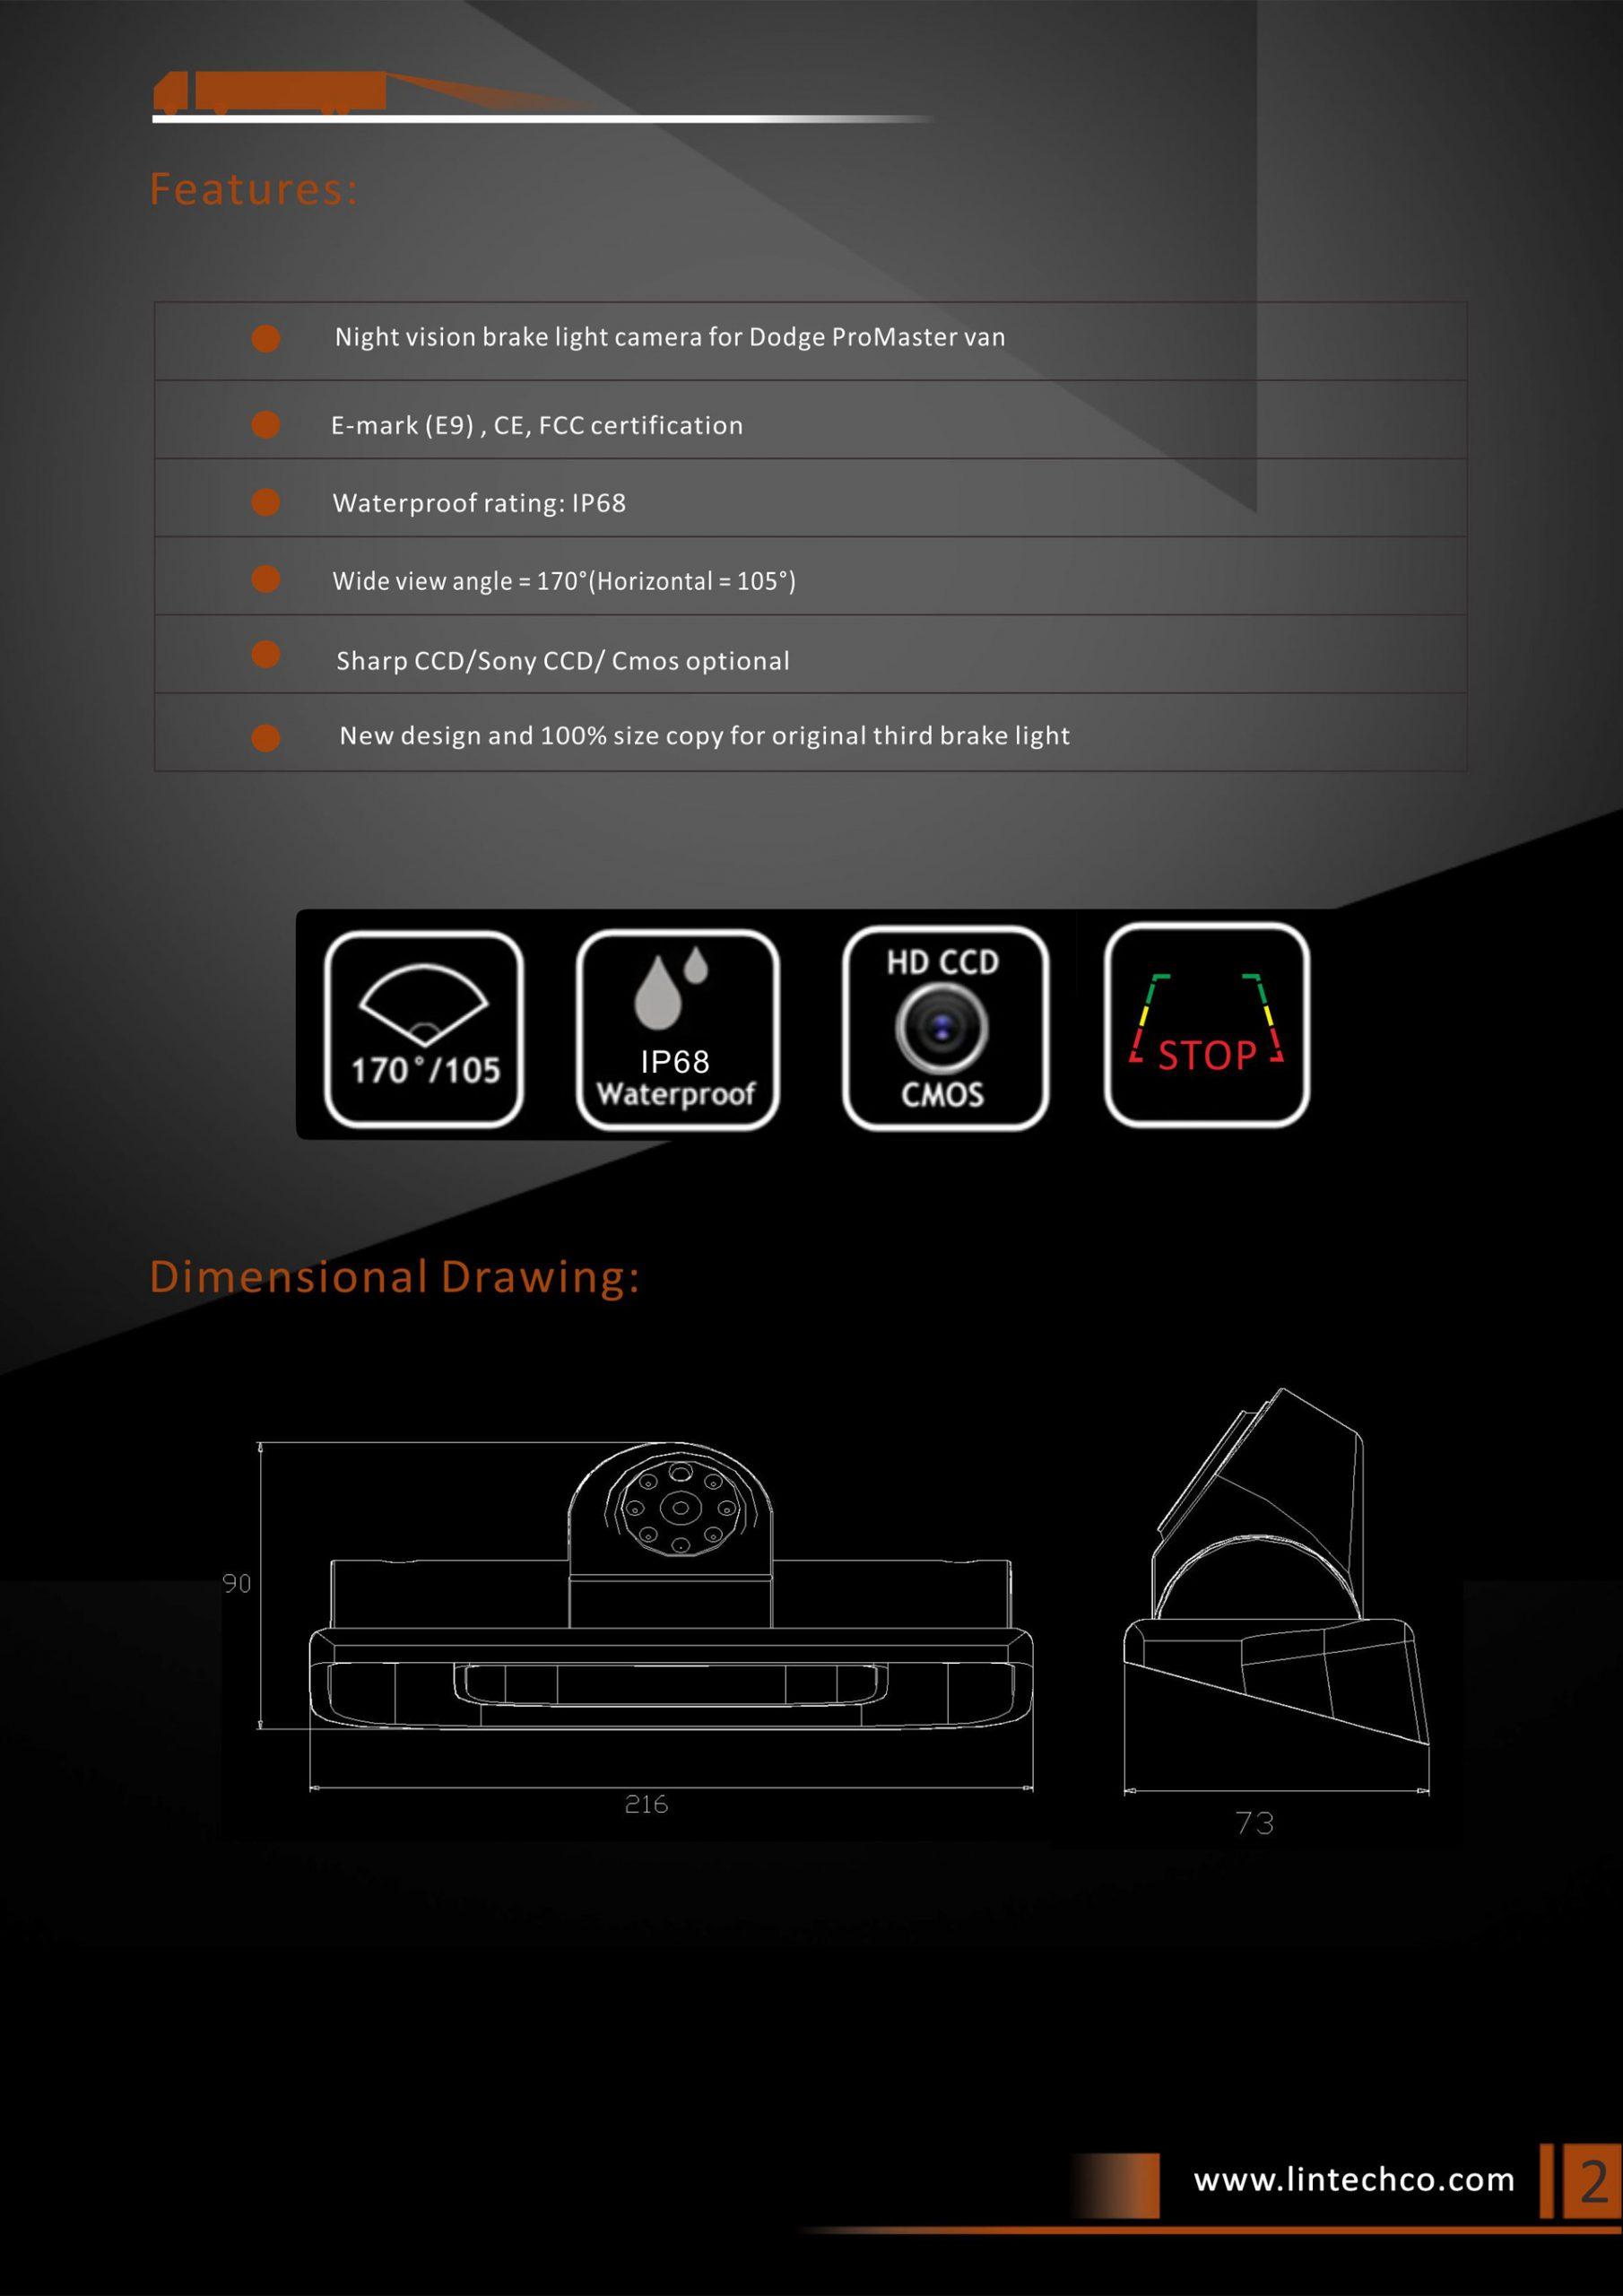 2. Rear View Camera for Dodge ProMaster